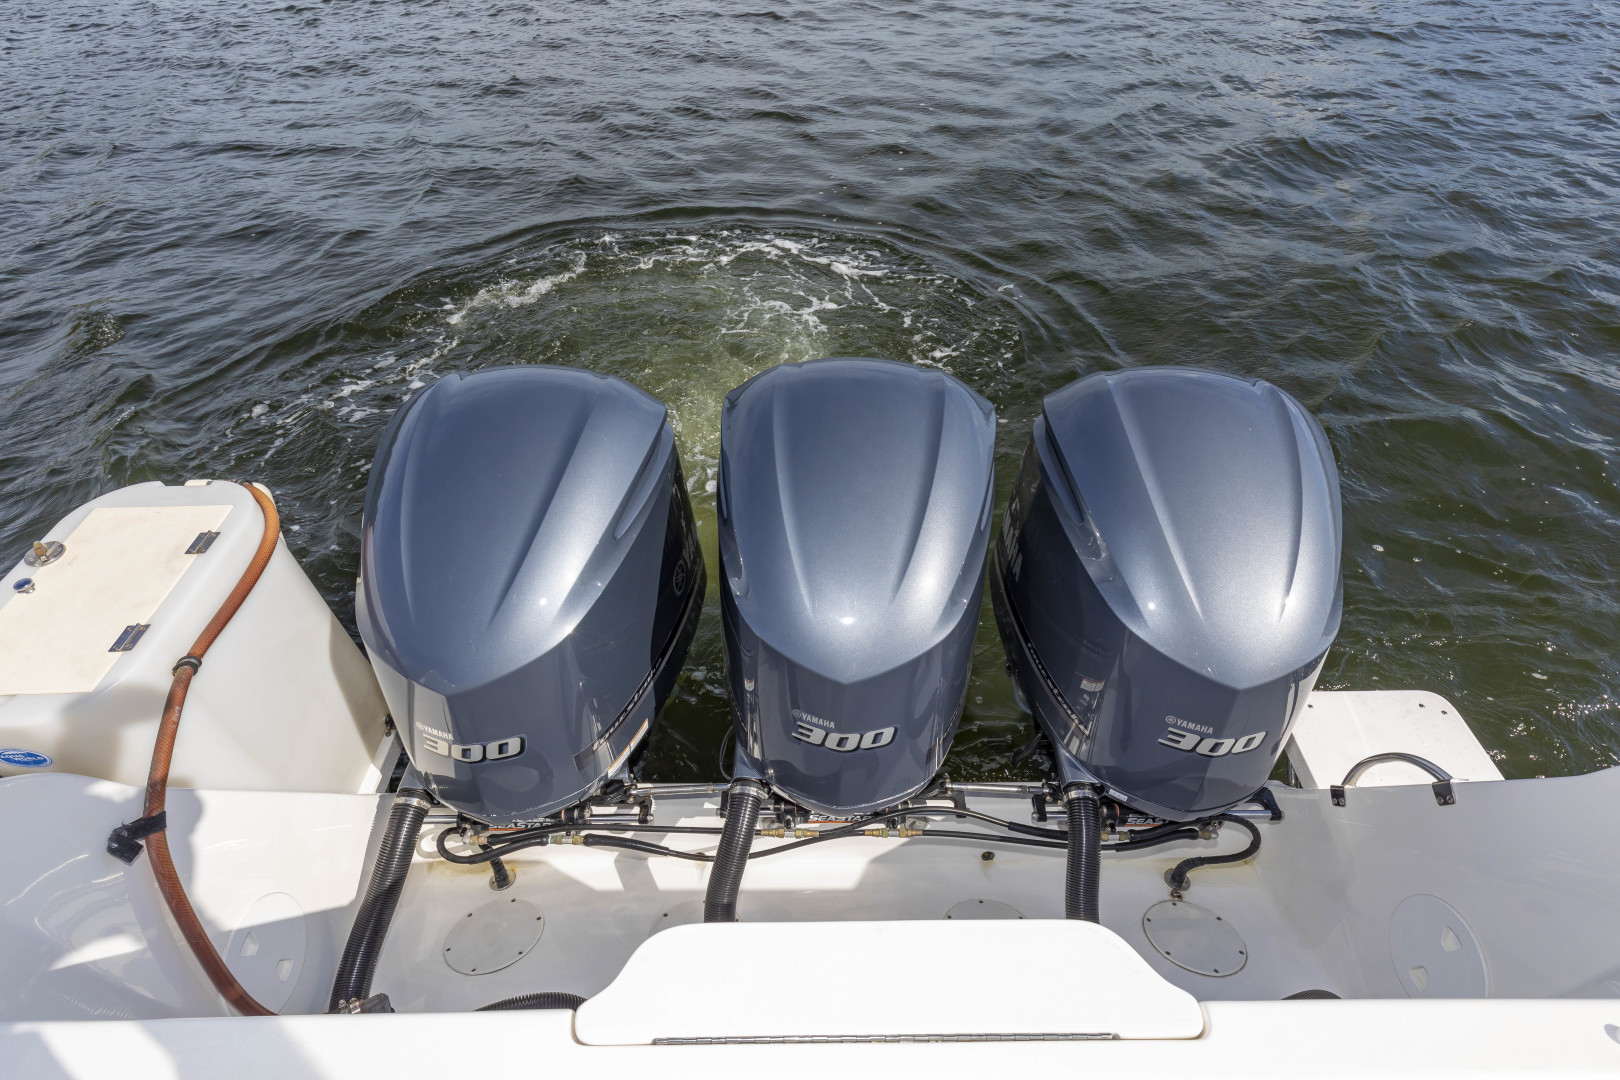 Intrepid-377 Walkaround 2005-Rock Boat REFIT 2018 Dania Beach-Florida-United States-377 Intrepid Motors 1-1511554 | Thumbnail